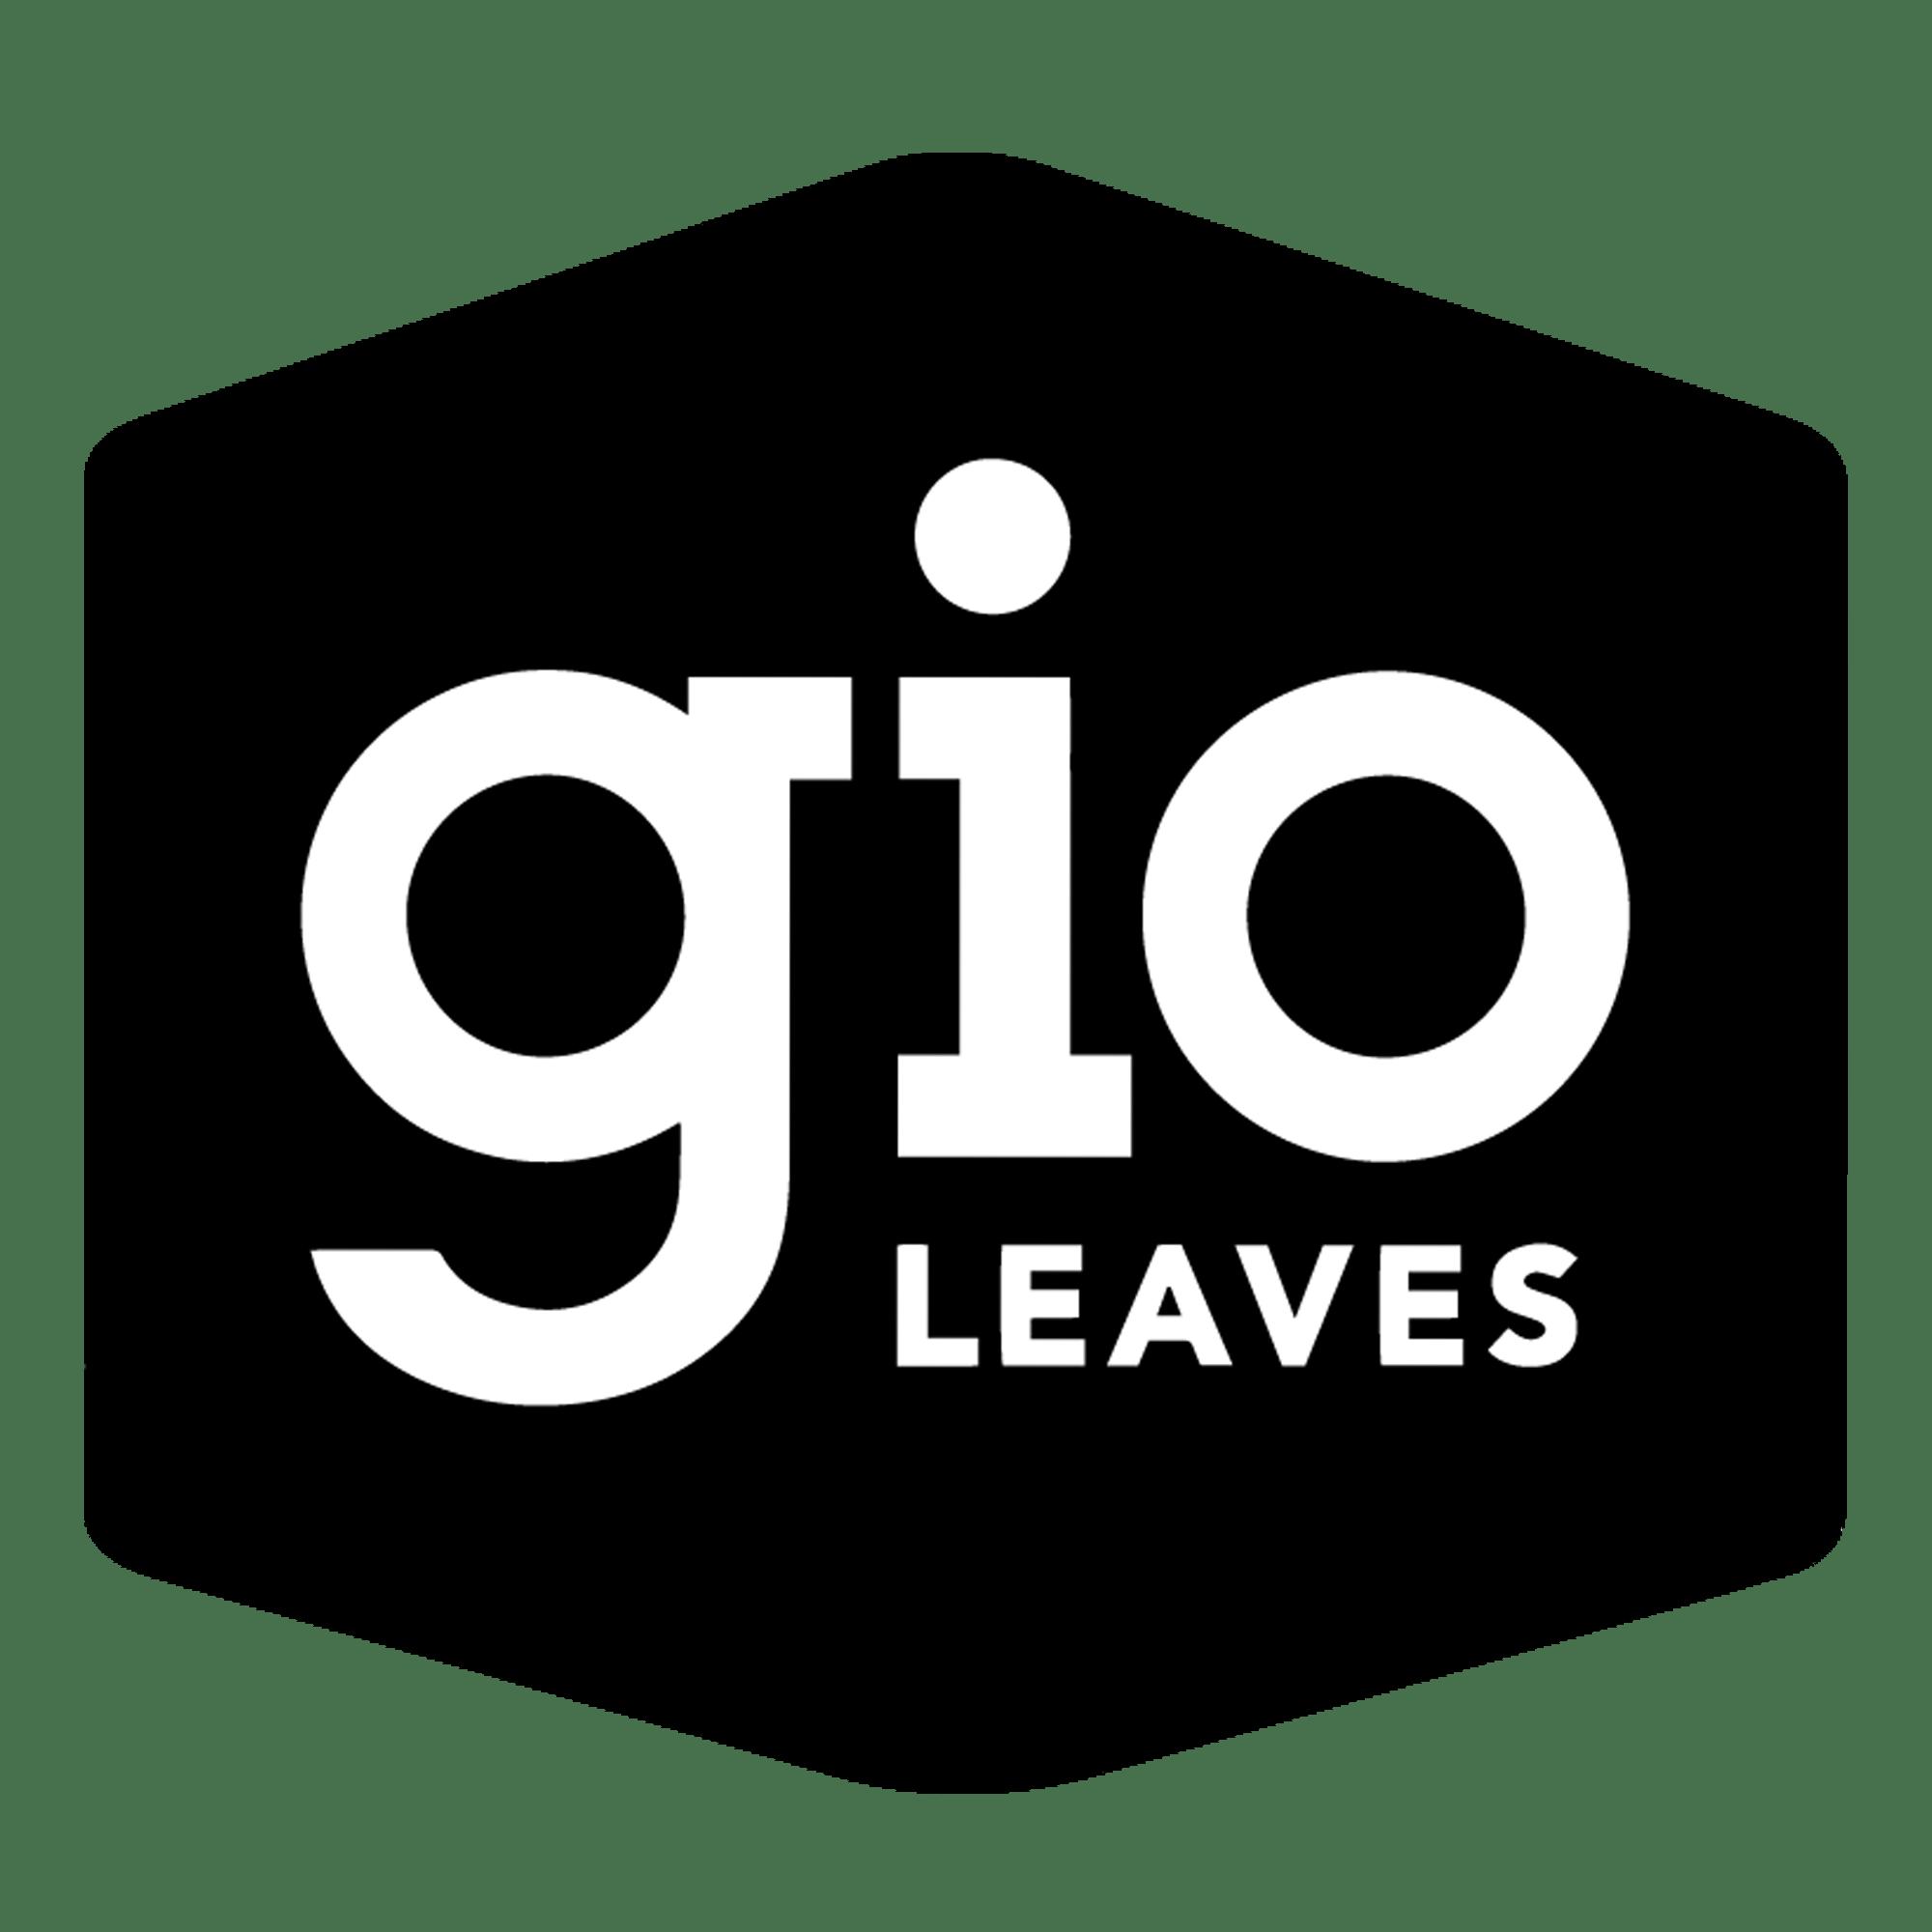 Logo Gio Coffee - Gio Leaves